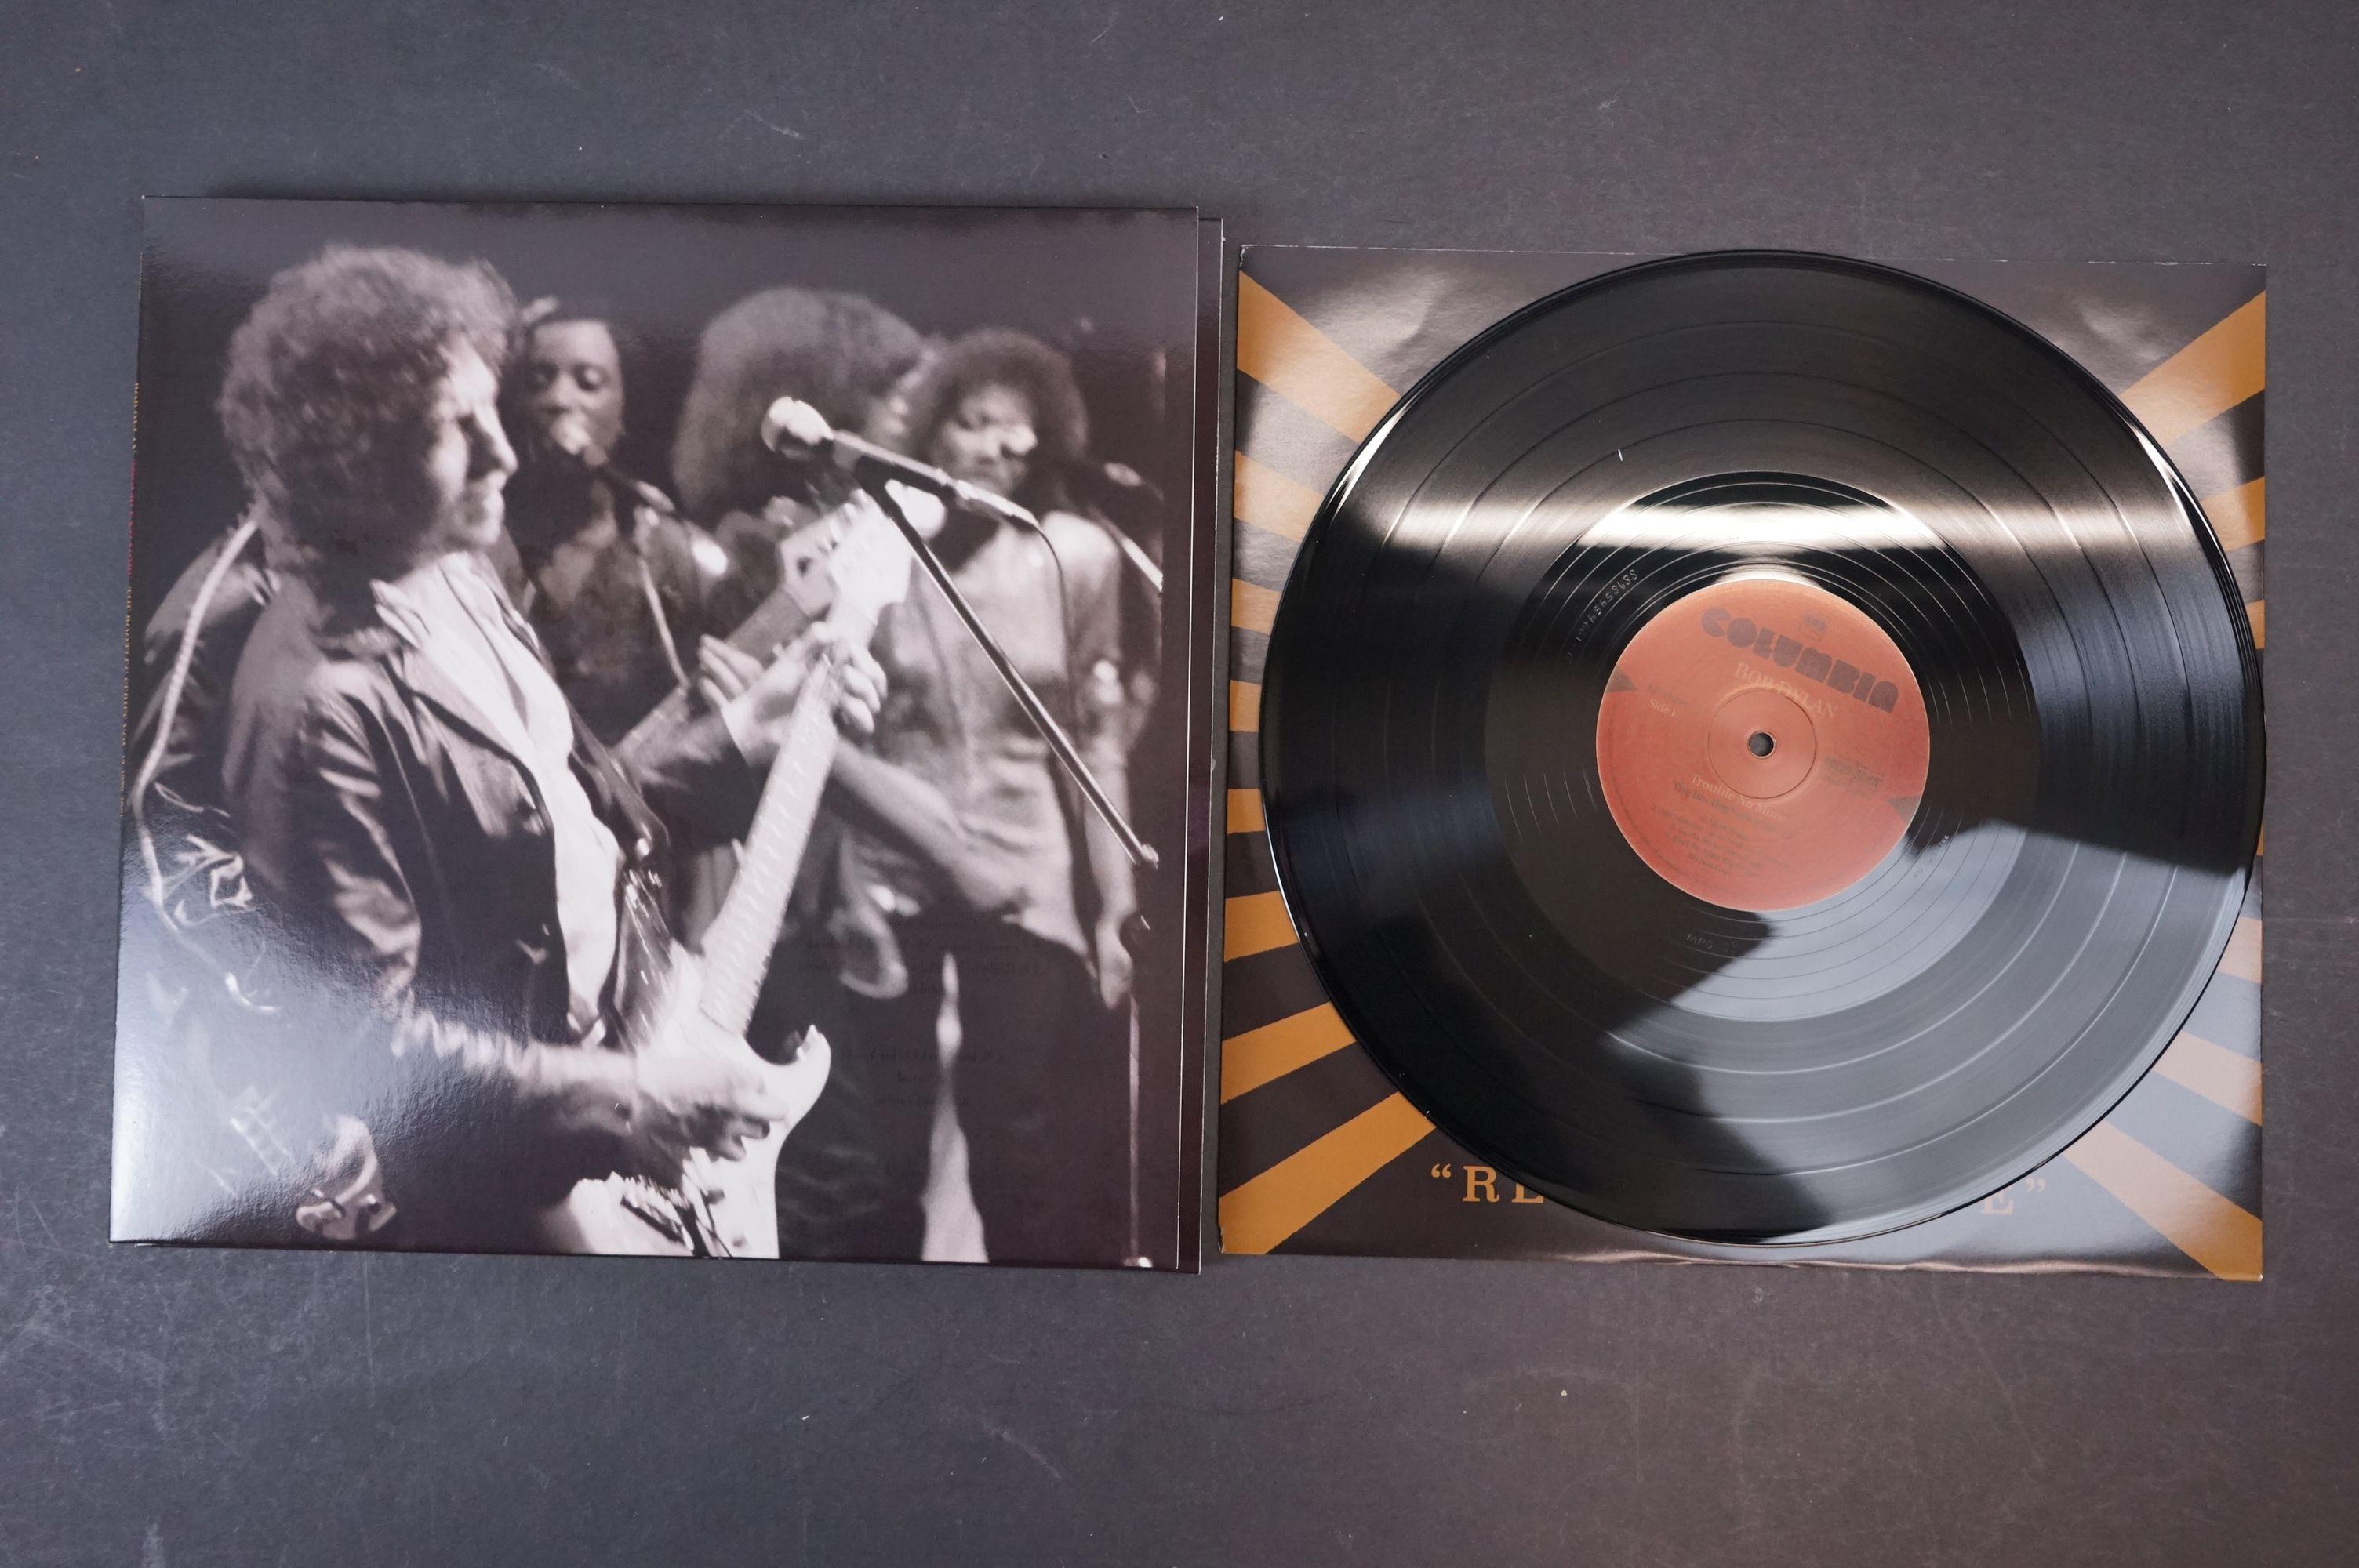 Vinyl - Bob Dylan Trouble No More The Bootleg Series vol 13 1979-1981 4 LP Box Set, ex - Image 7 of 9